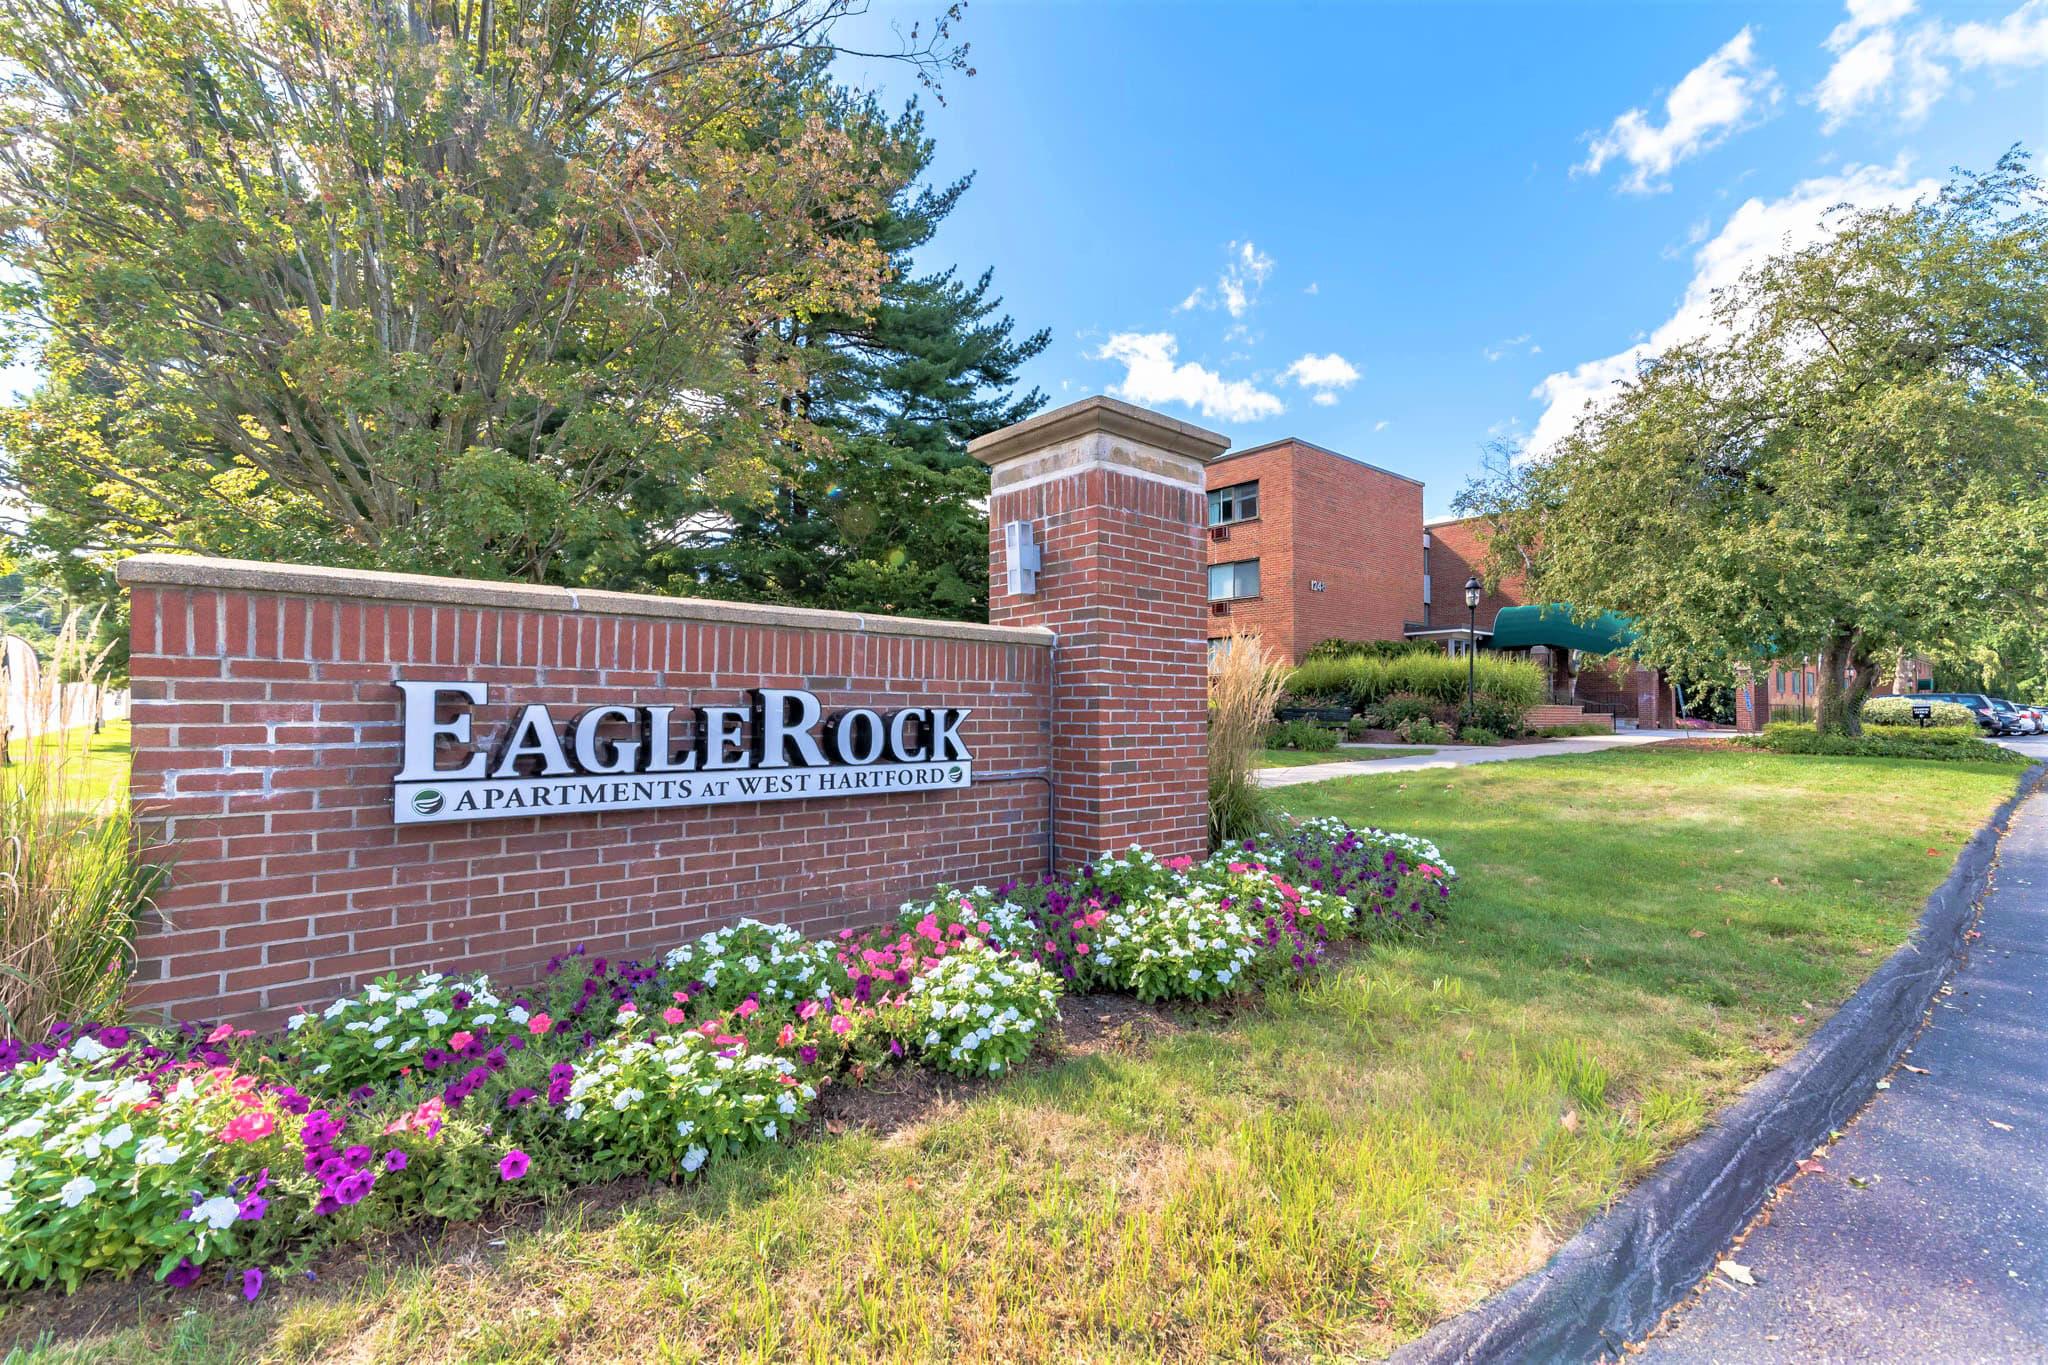 Brick sign for Eagle Rock Apartments at West Hartford in West Hartford, Connecticut